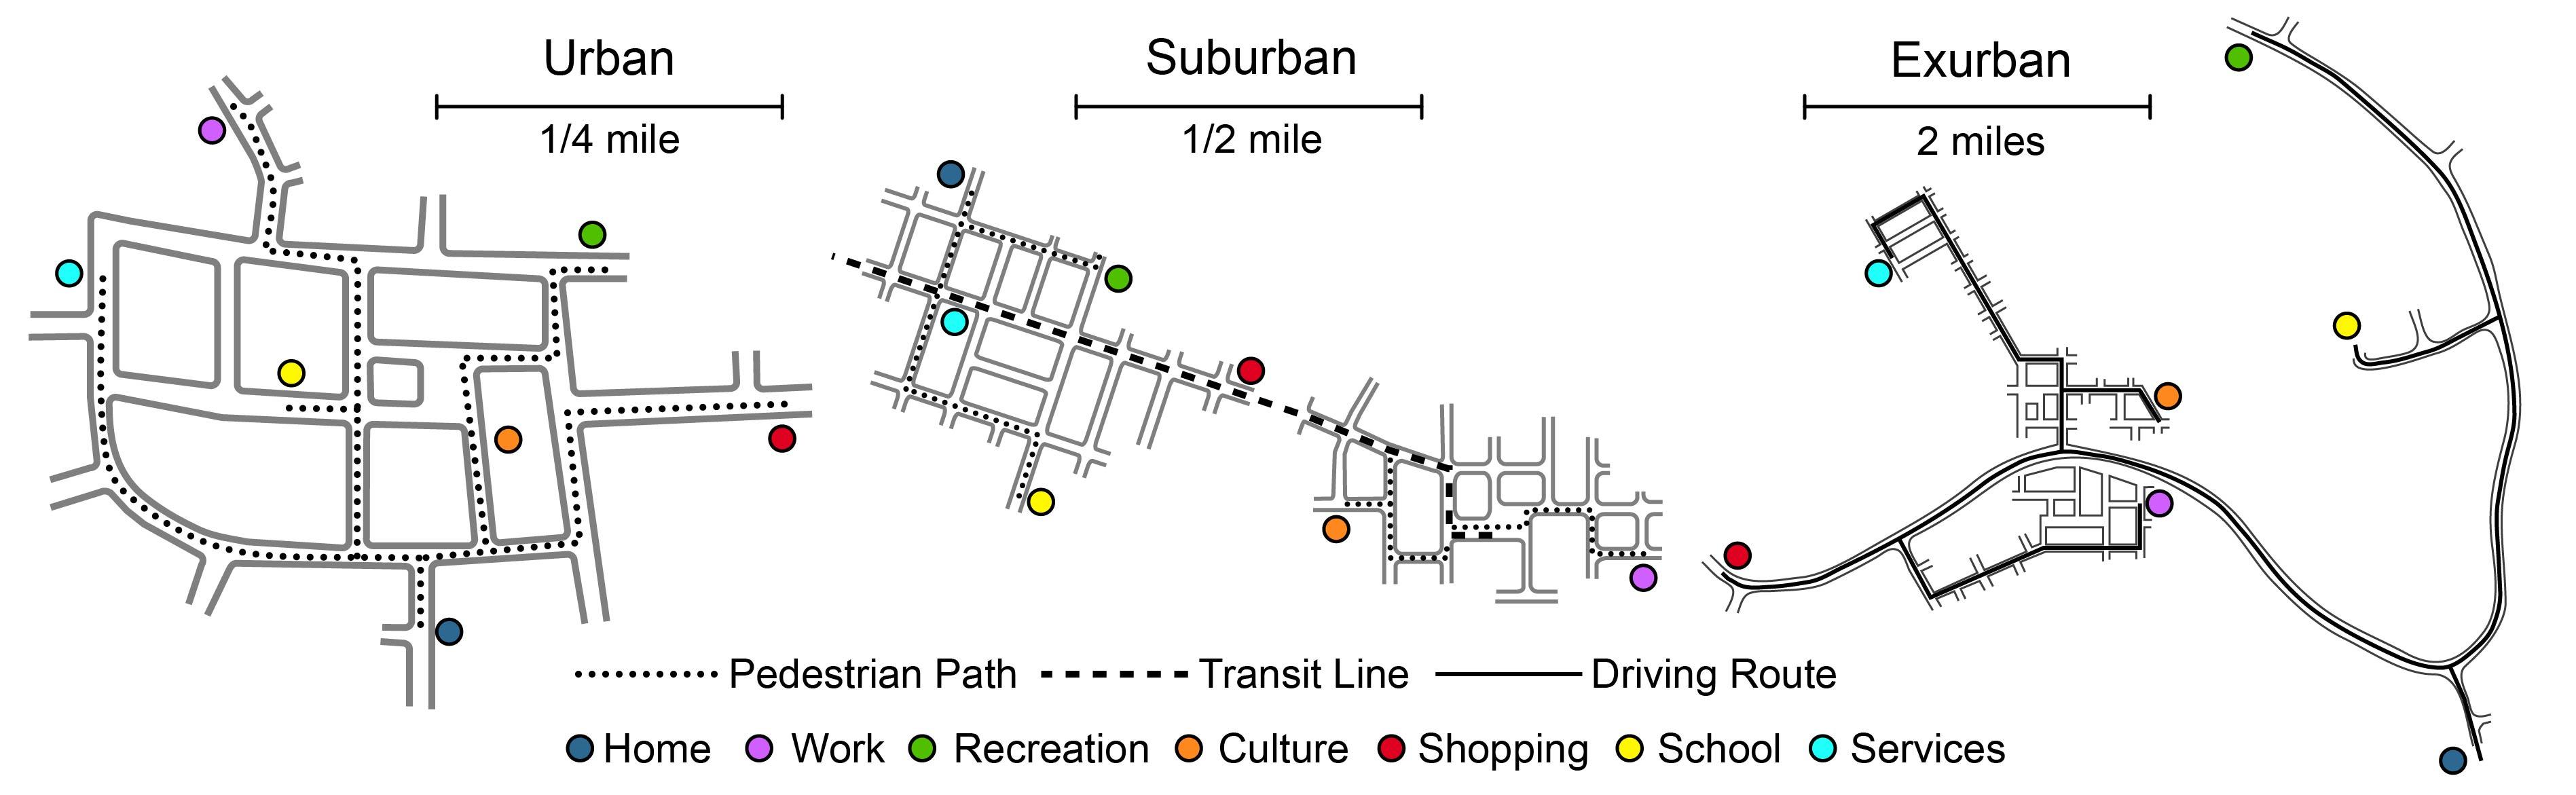 Rural Urban Suburban Worksheet